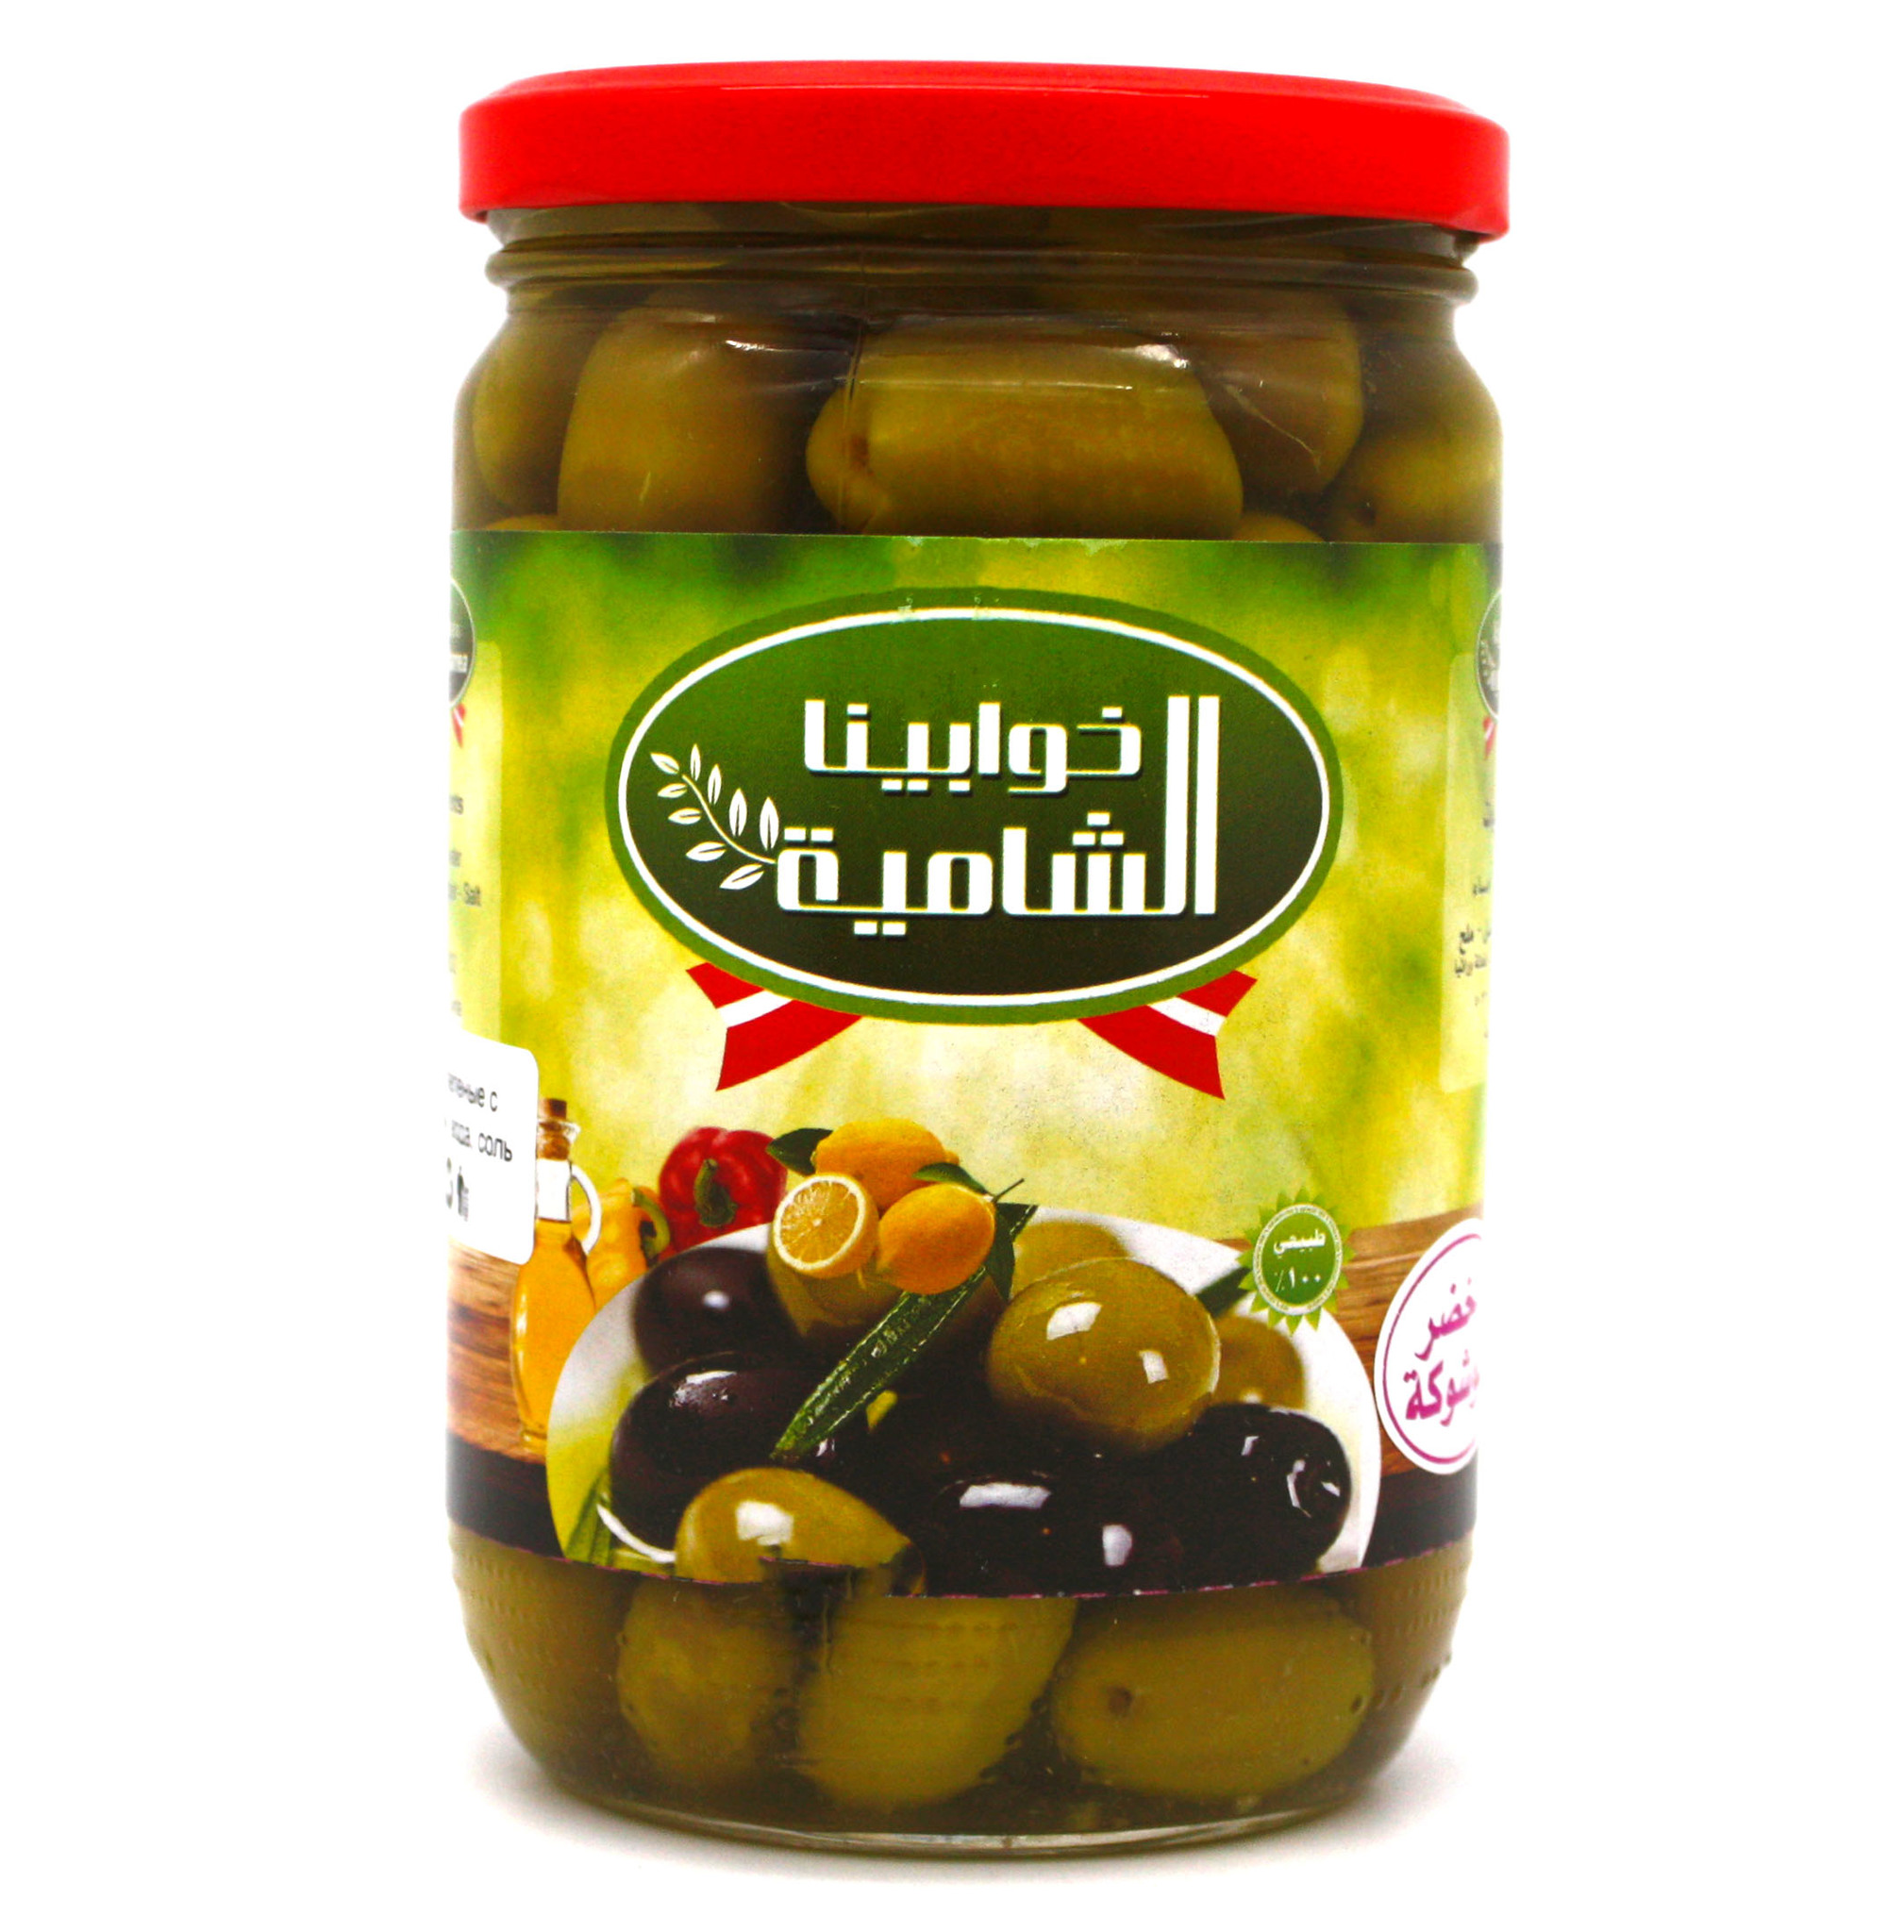 Оливки зеленые, Al Shamea, 400 г import_files_20_209c7d7b2dd011e9a9a6484d7ecee297_8928833d30f111e9a9a6484d7ecee297.jpg